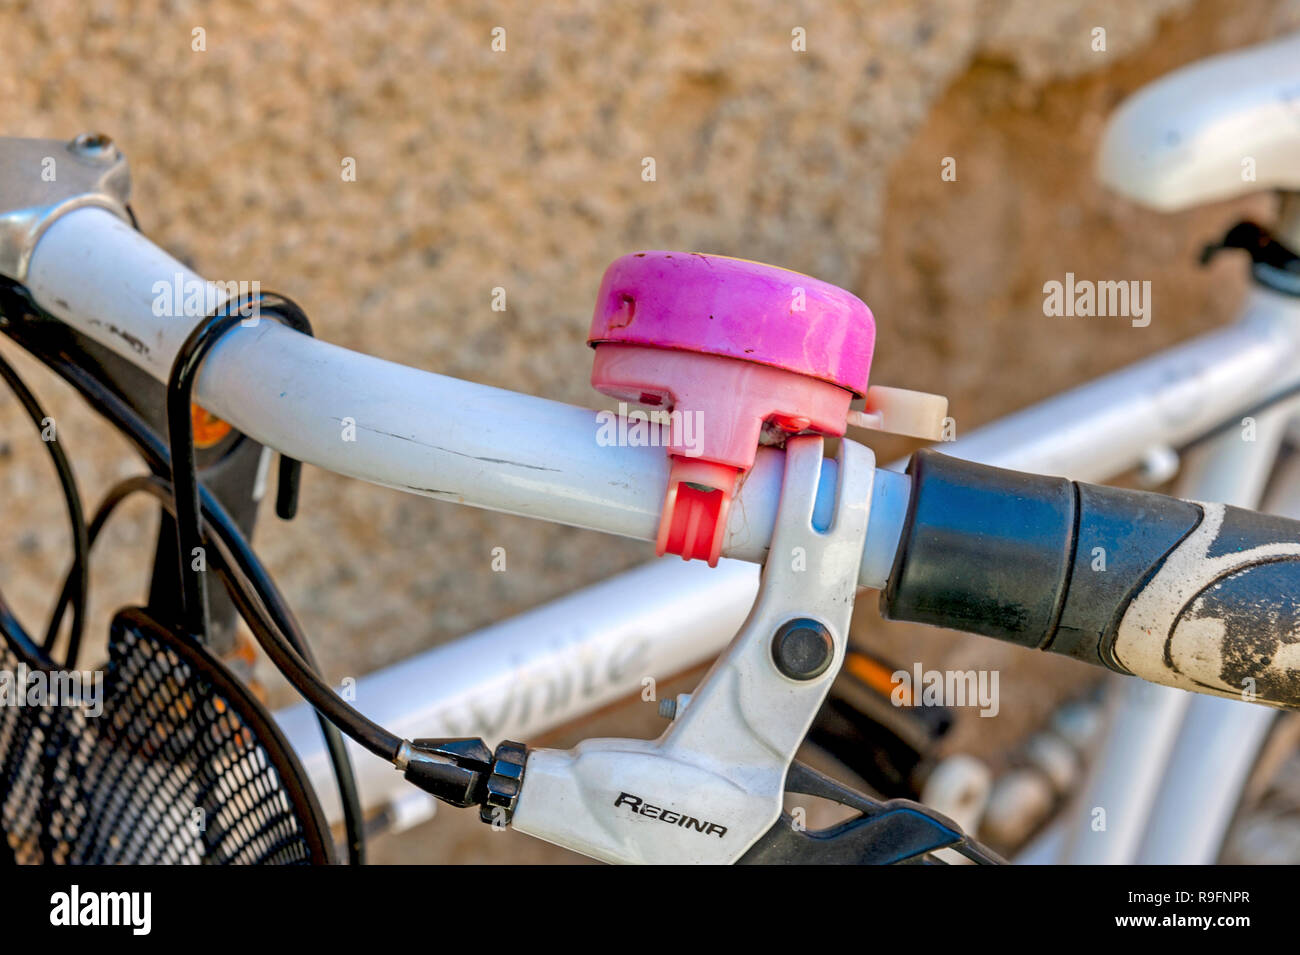 Pink bell on bicycle handlebars - Stock Image